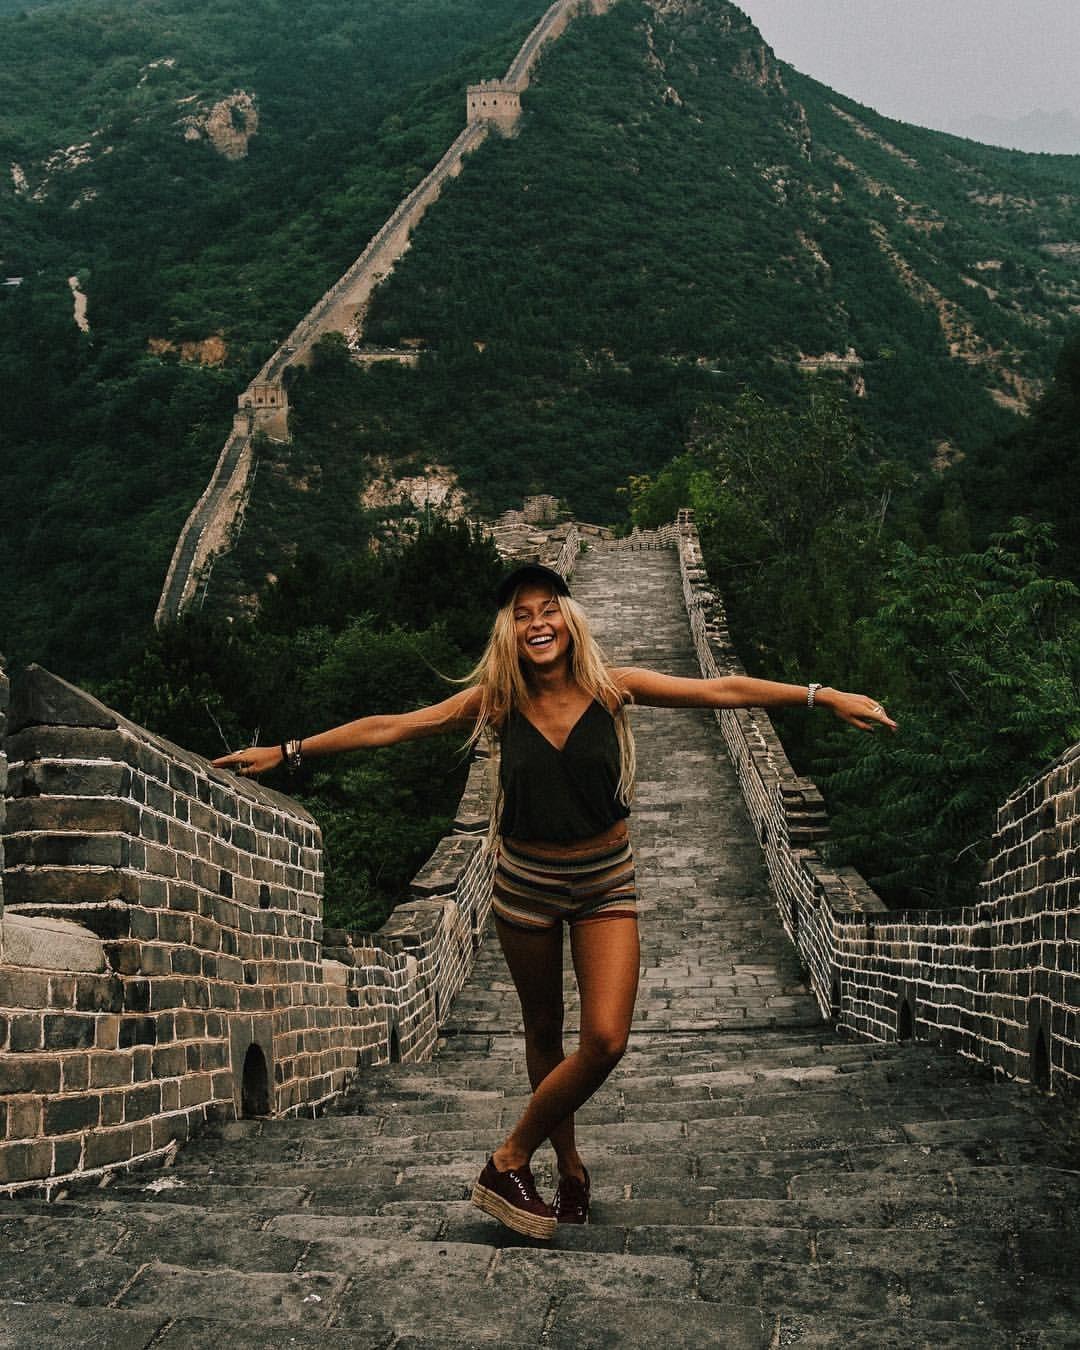 "ANDREA BELVER on Instagram: ""One of the seven wonders ✓ - best memories of the year.  #greatwallofchina ☾ #2017"", #Andrea #BELVER #greatwallofchina #Instagram #Memories #sevenwondersoftheworld #wonders #Year"